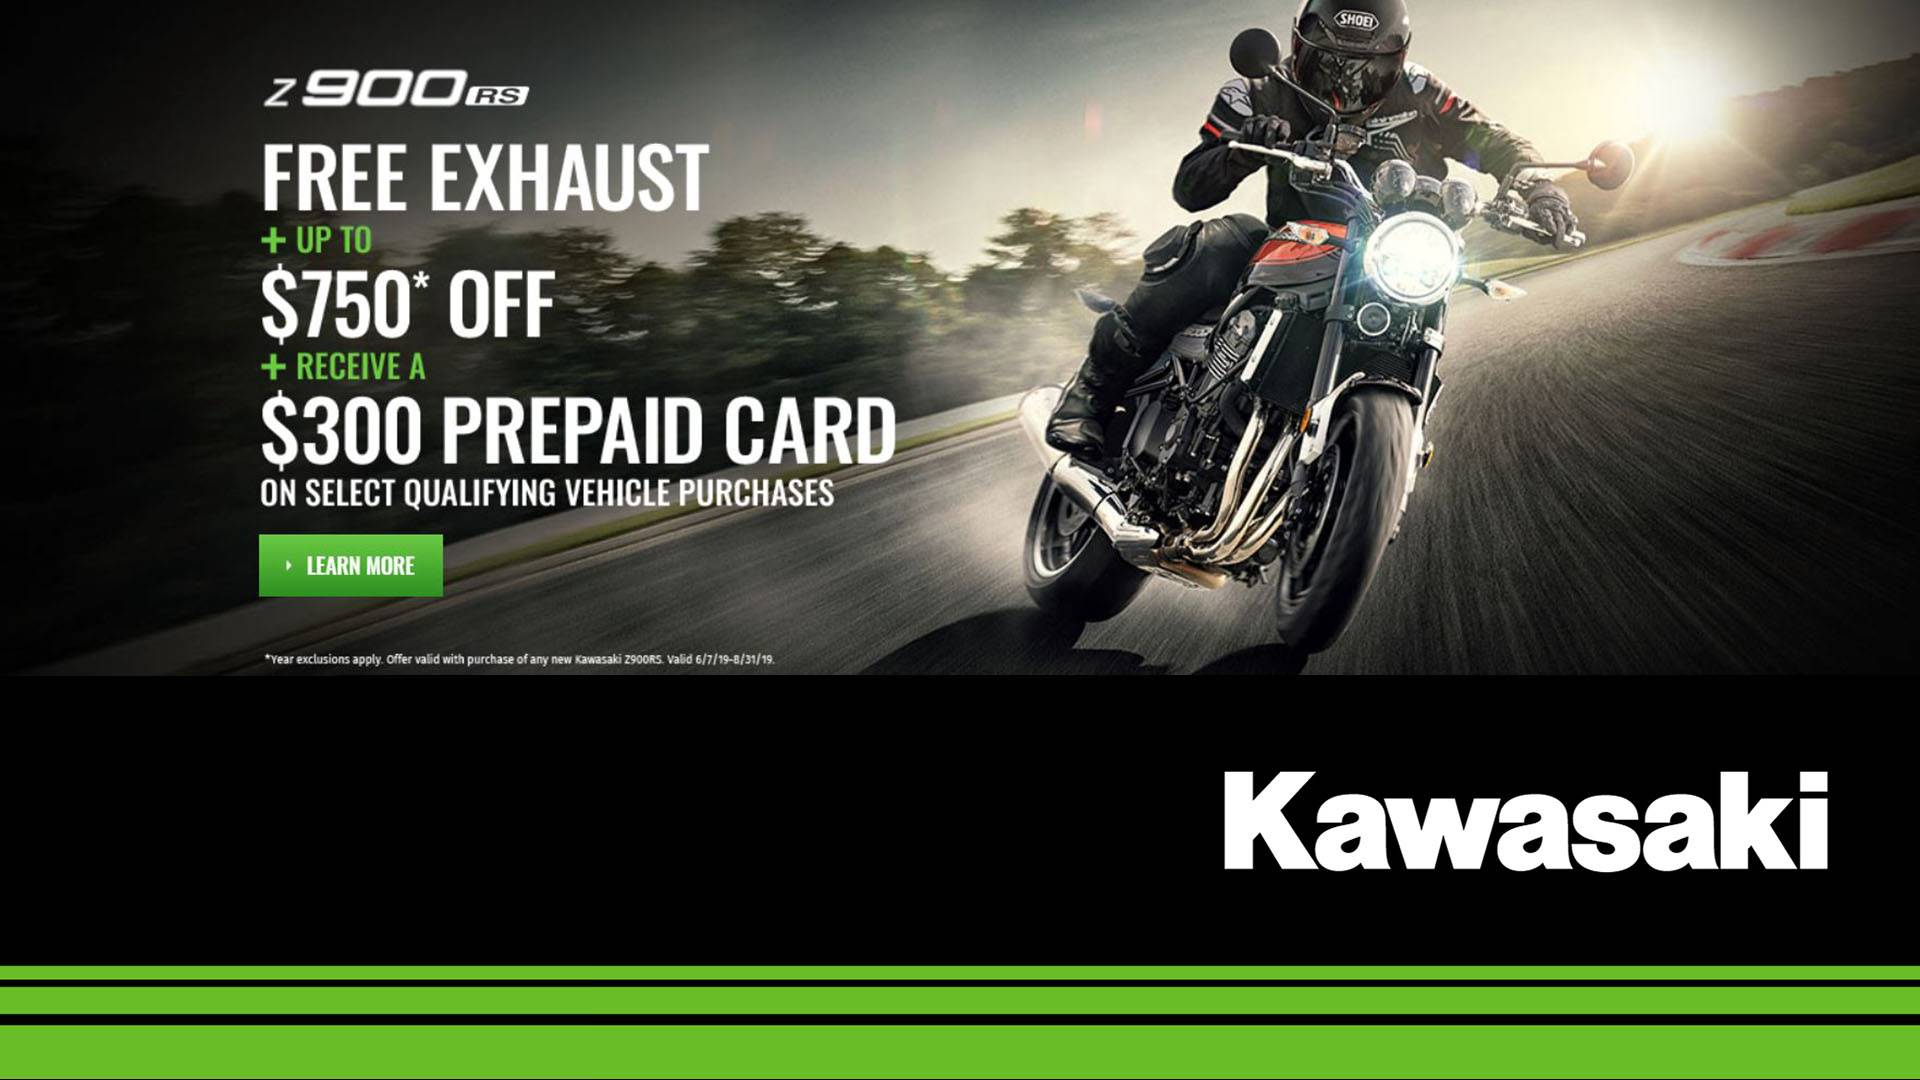 Plano Kawasaki Suzuki | Motorcycles, ATVs & UTVs for Sale near Dallas